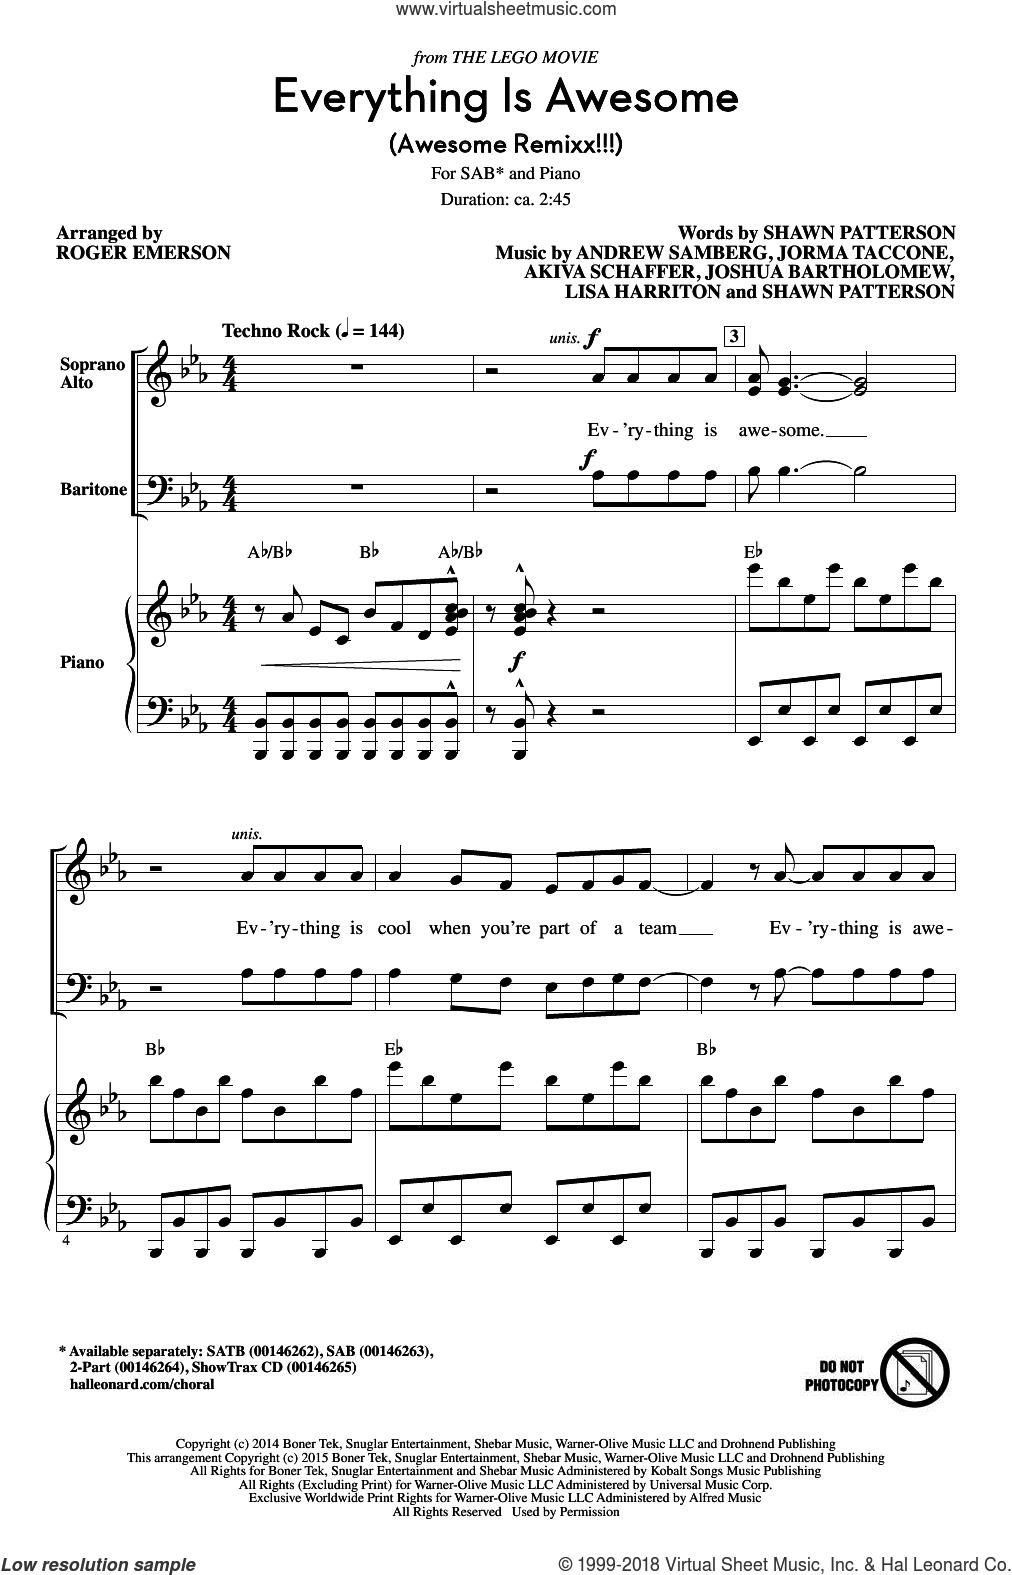 Everything Is Awesome (Awesome Remixx!!!) sheet music for choir (SAB: soprano, alto, bass) by Roger Emerson, Akiva Schaffer, Andrew Samberg, Jorma Taccone, Joshua Bartholomew, Lisa Harriton and Shawn Patterson, intermediate skill level